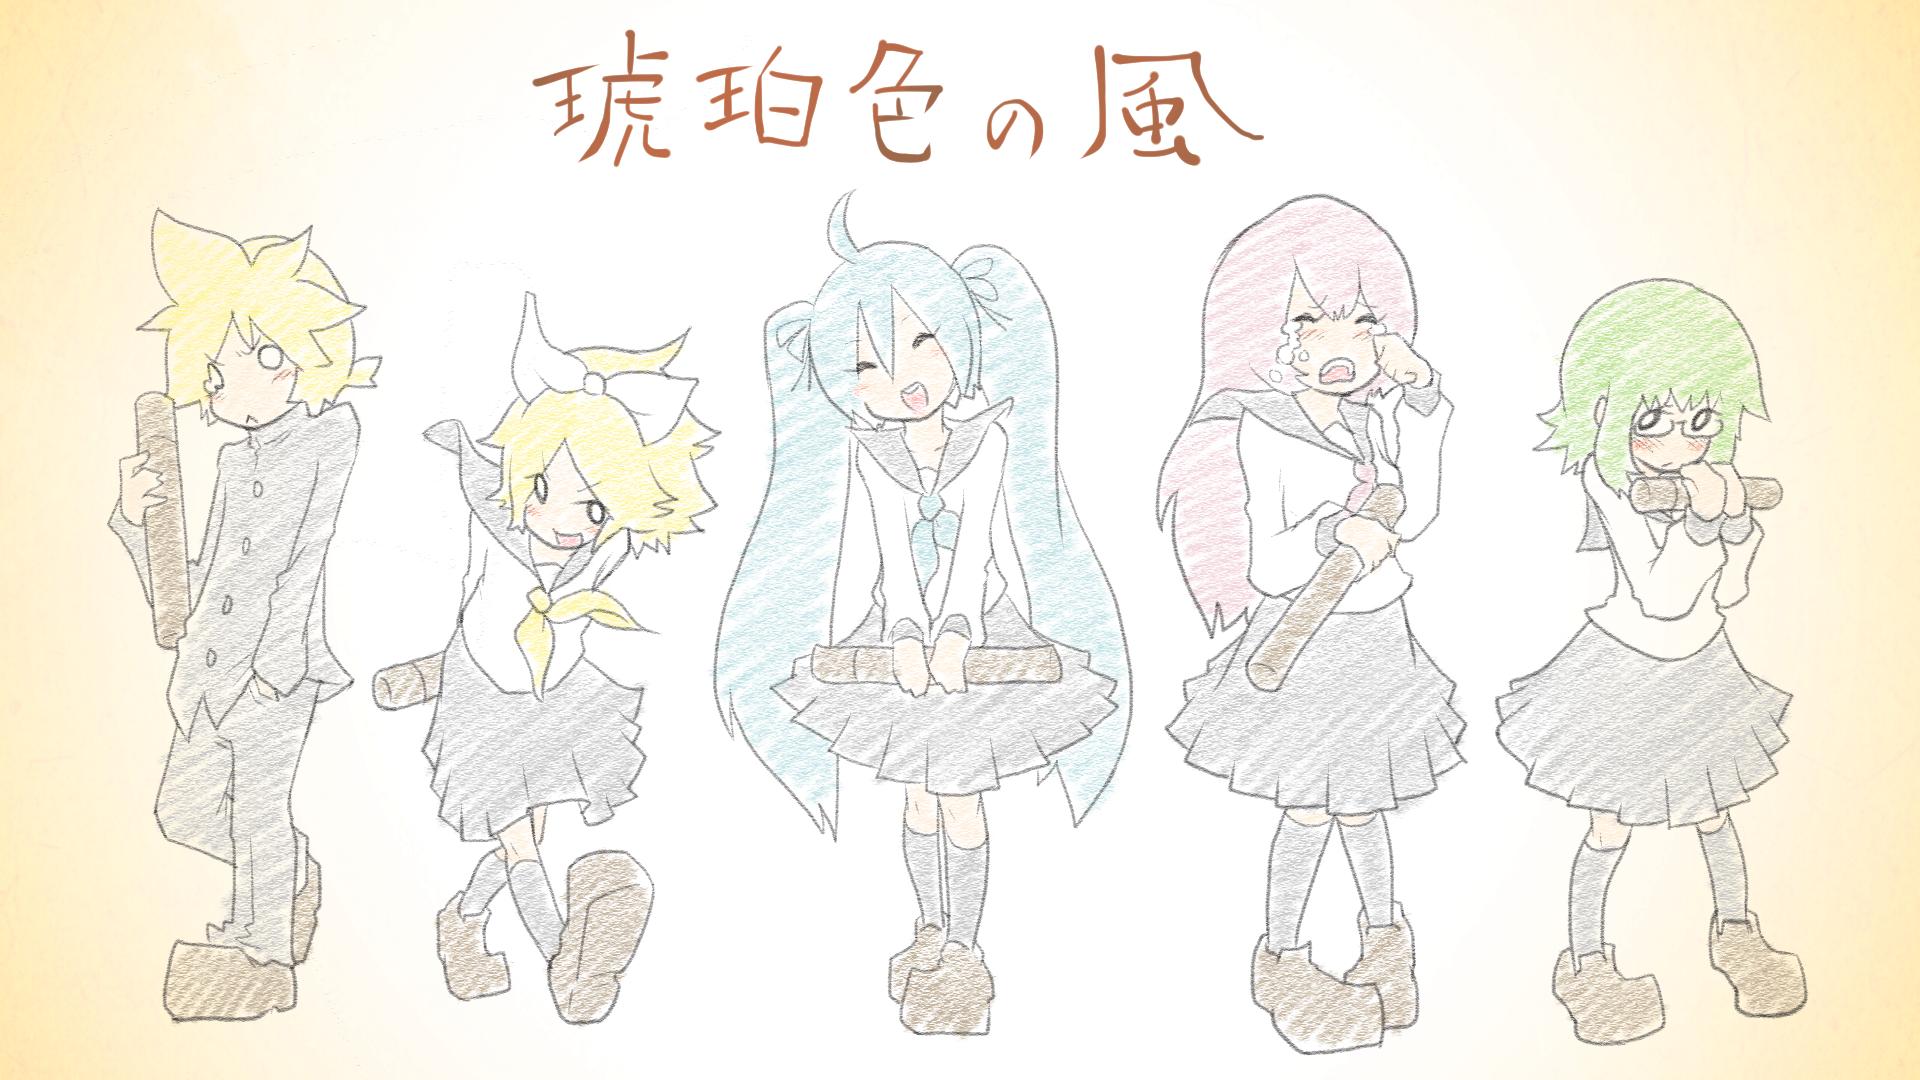 琥珀色の風 (Kohaku Iro no Kaze)